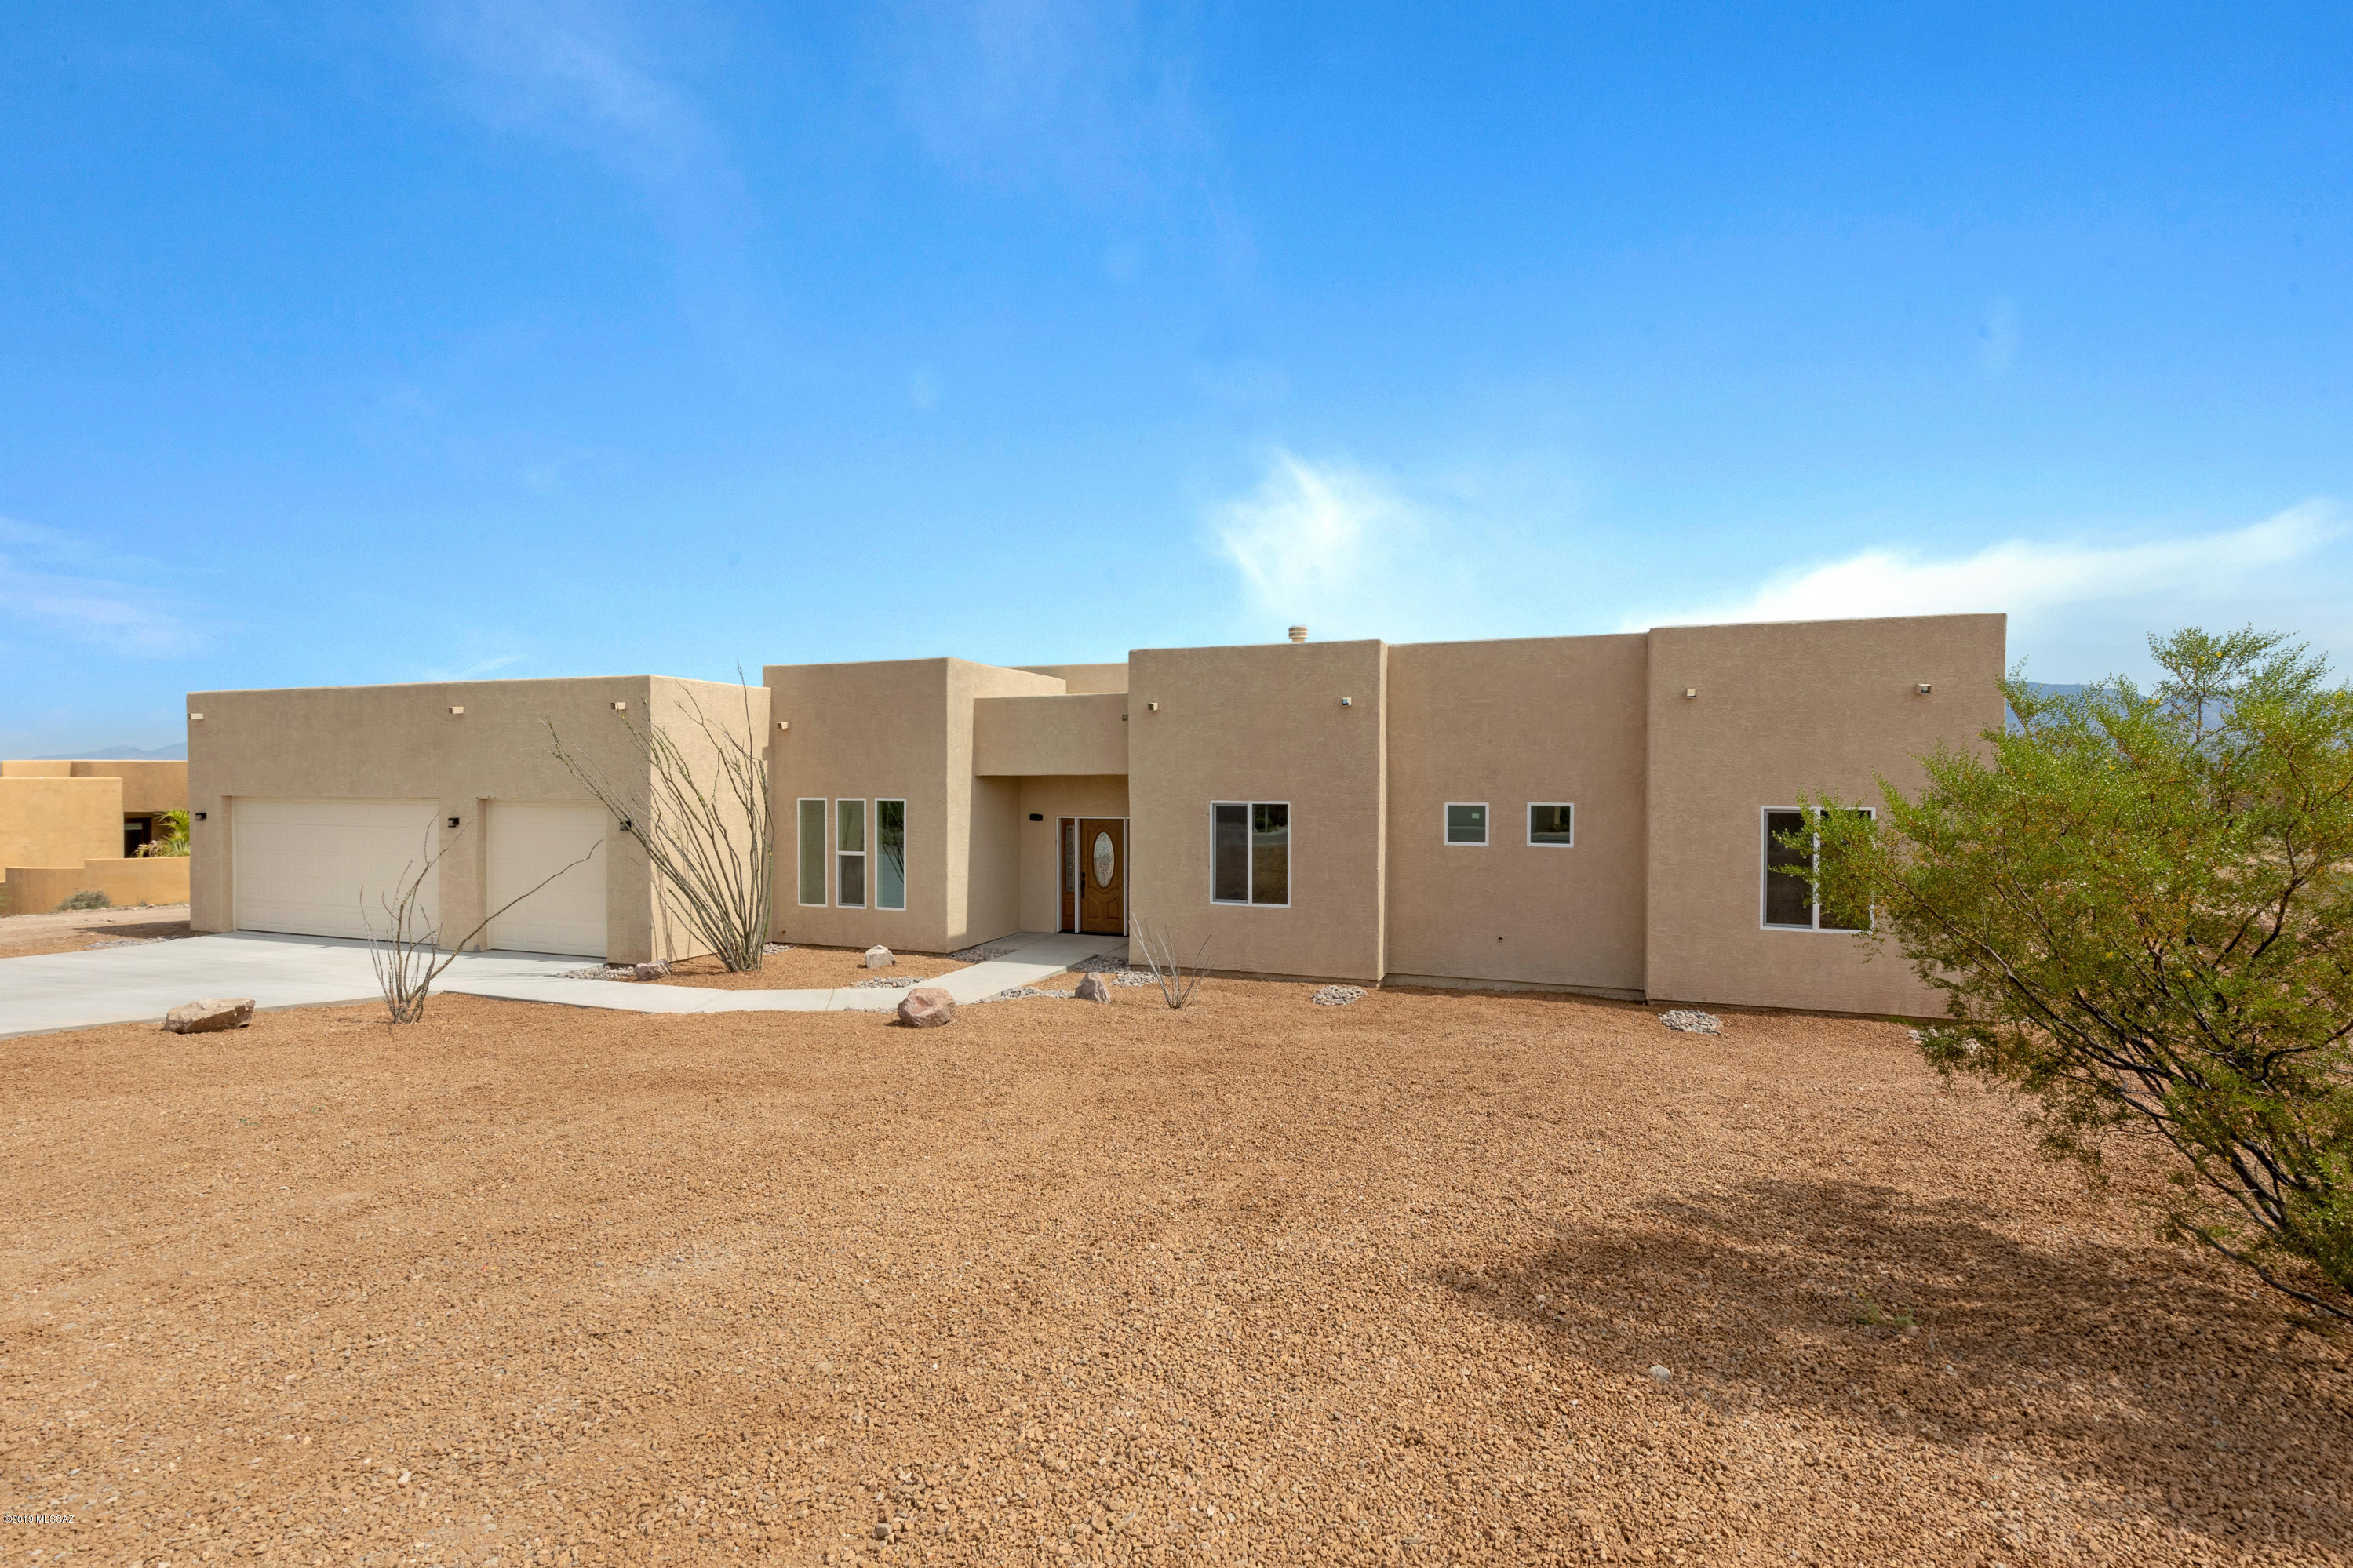 Photo of 13640 S Sonoita Ranch Circle, Vail, AZ 85641